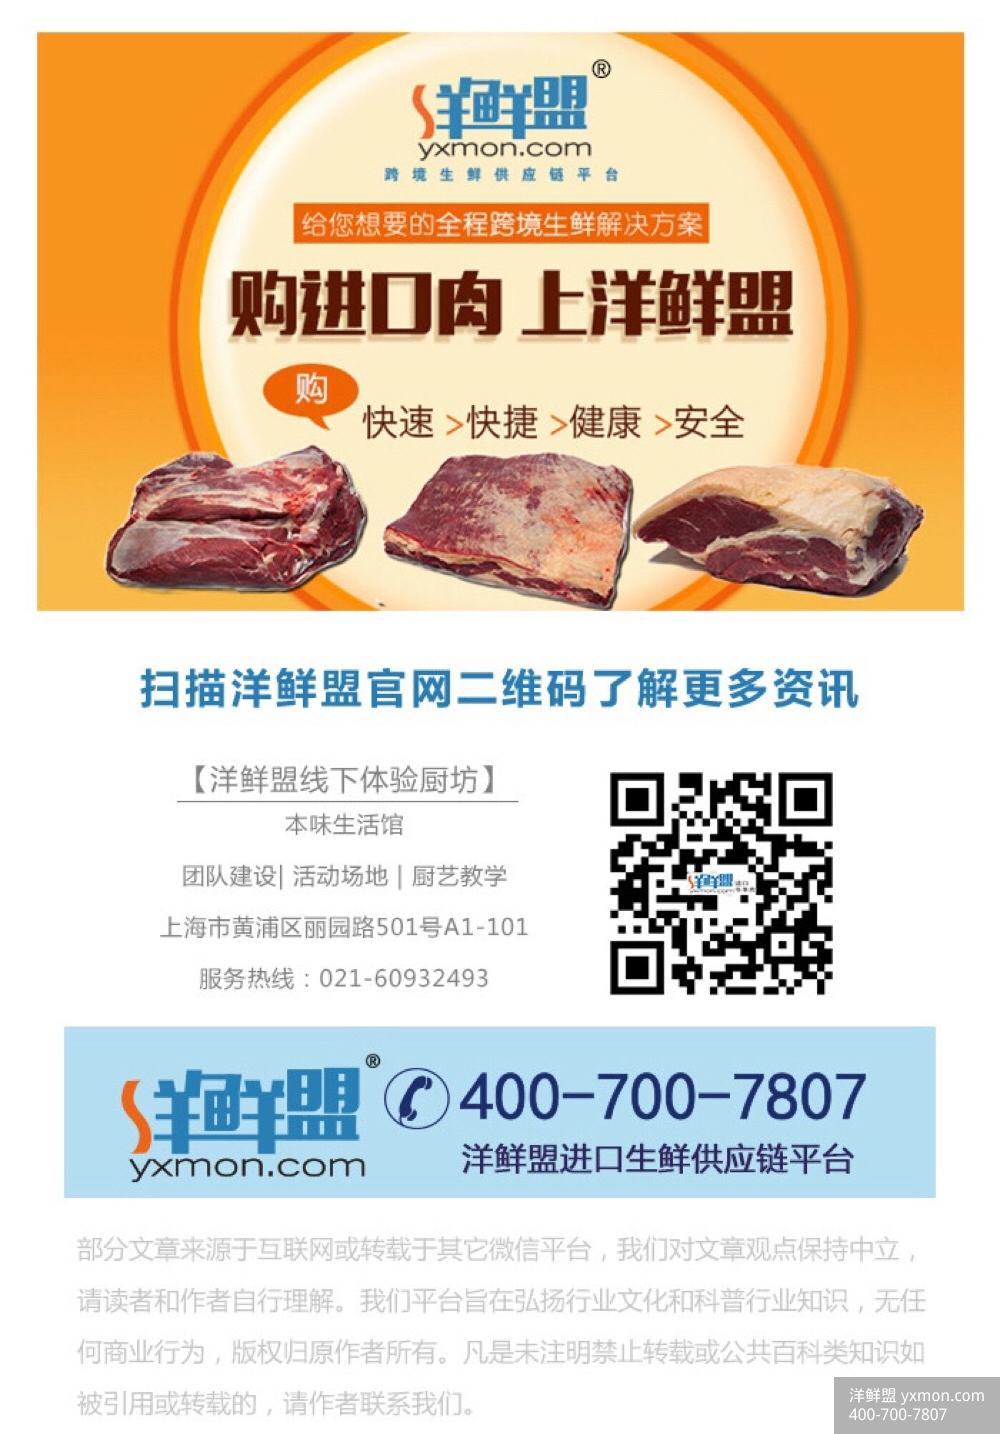 http://www.yxmon.com/data/upload/shop/article/05760713075285109.jpg